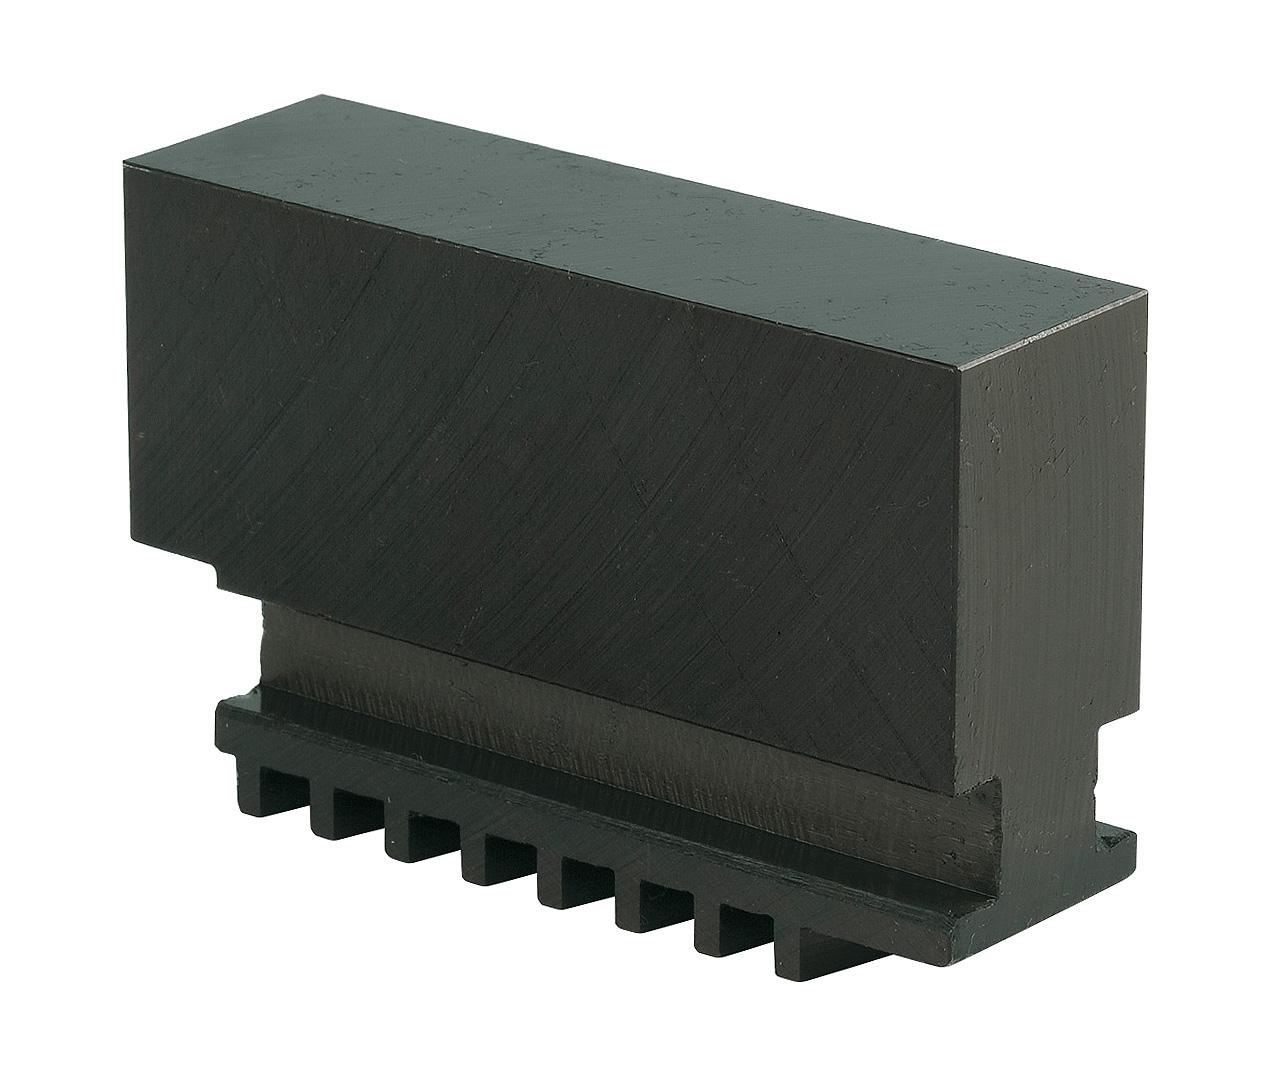 Szczęki jednolite miękkie - komplet DSJ-DK11-315 BERNARDO